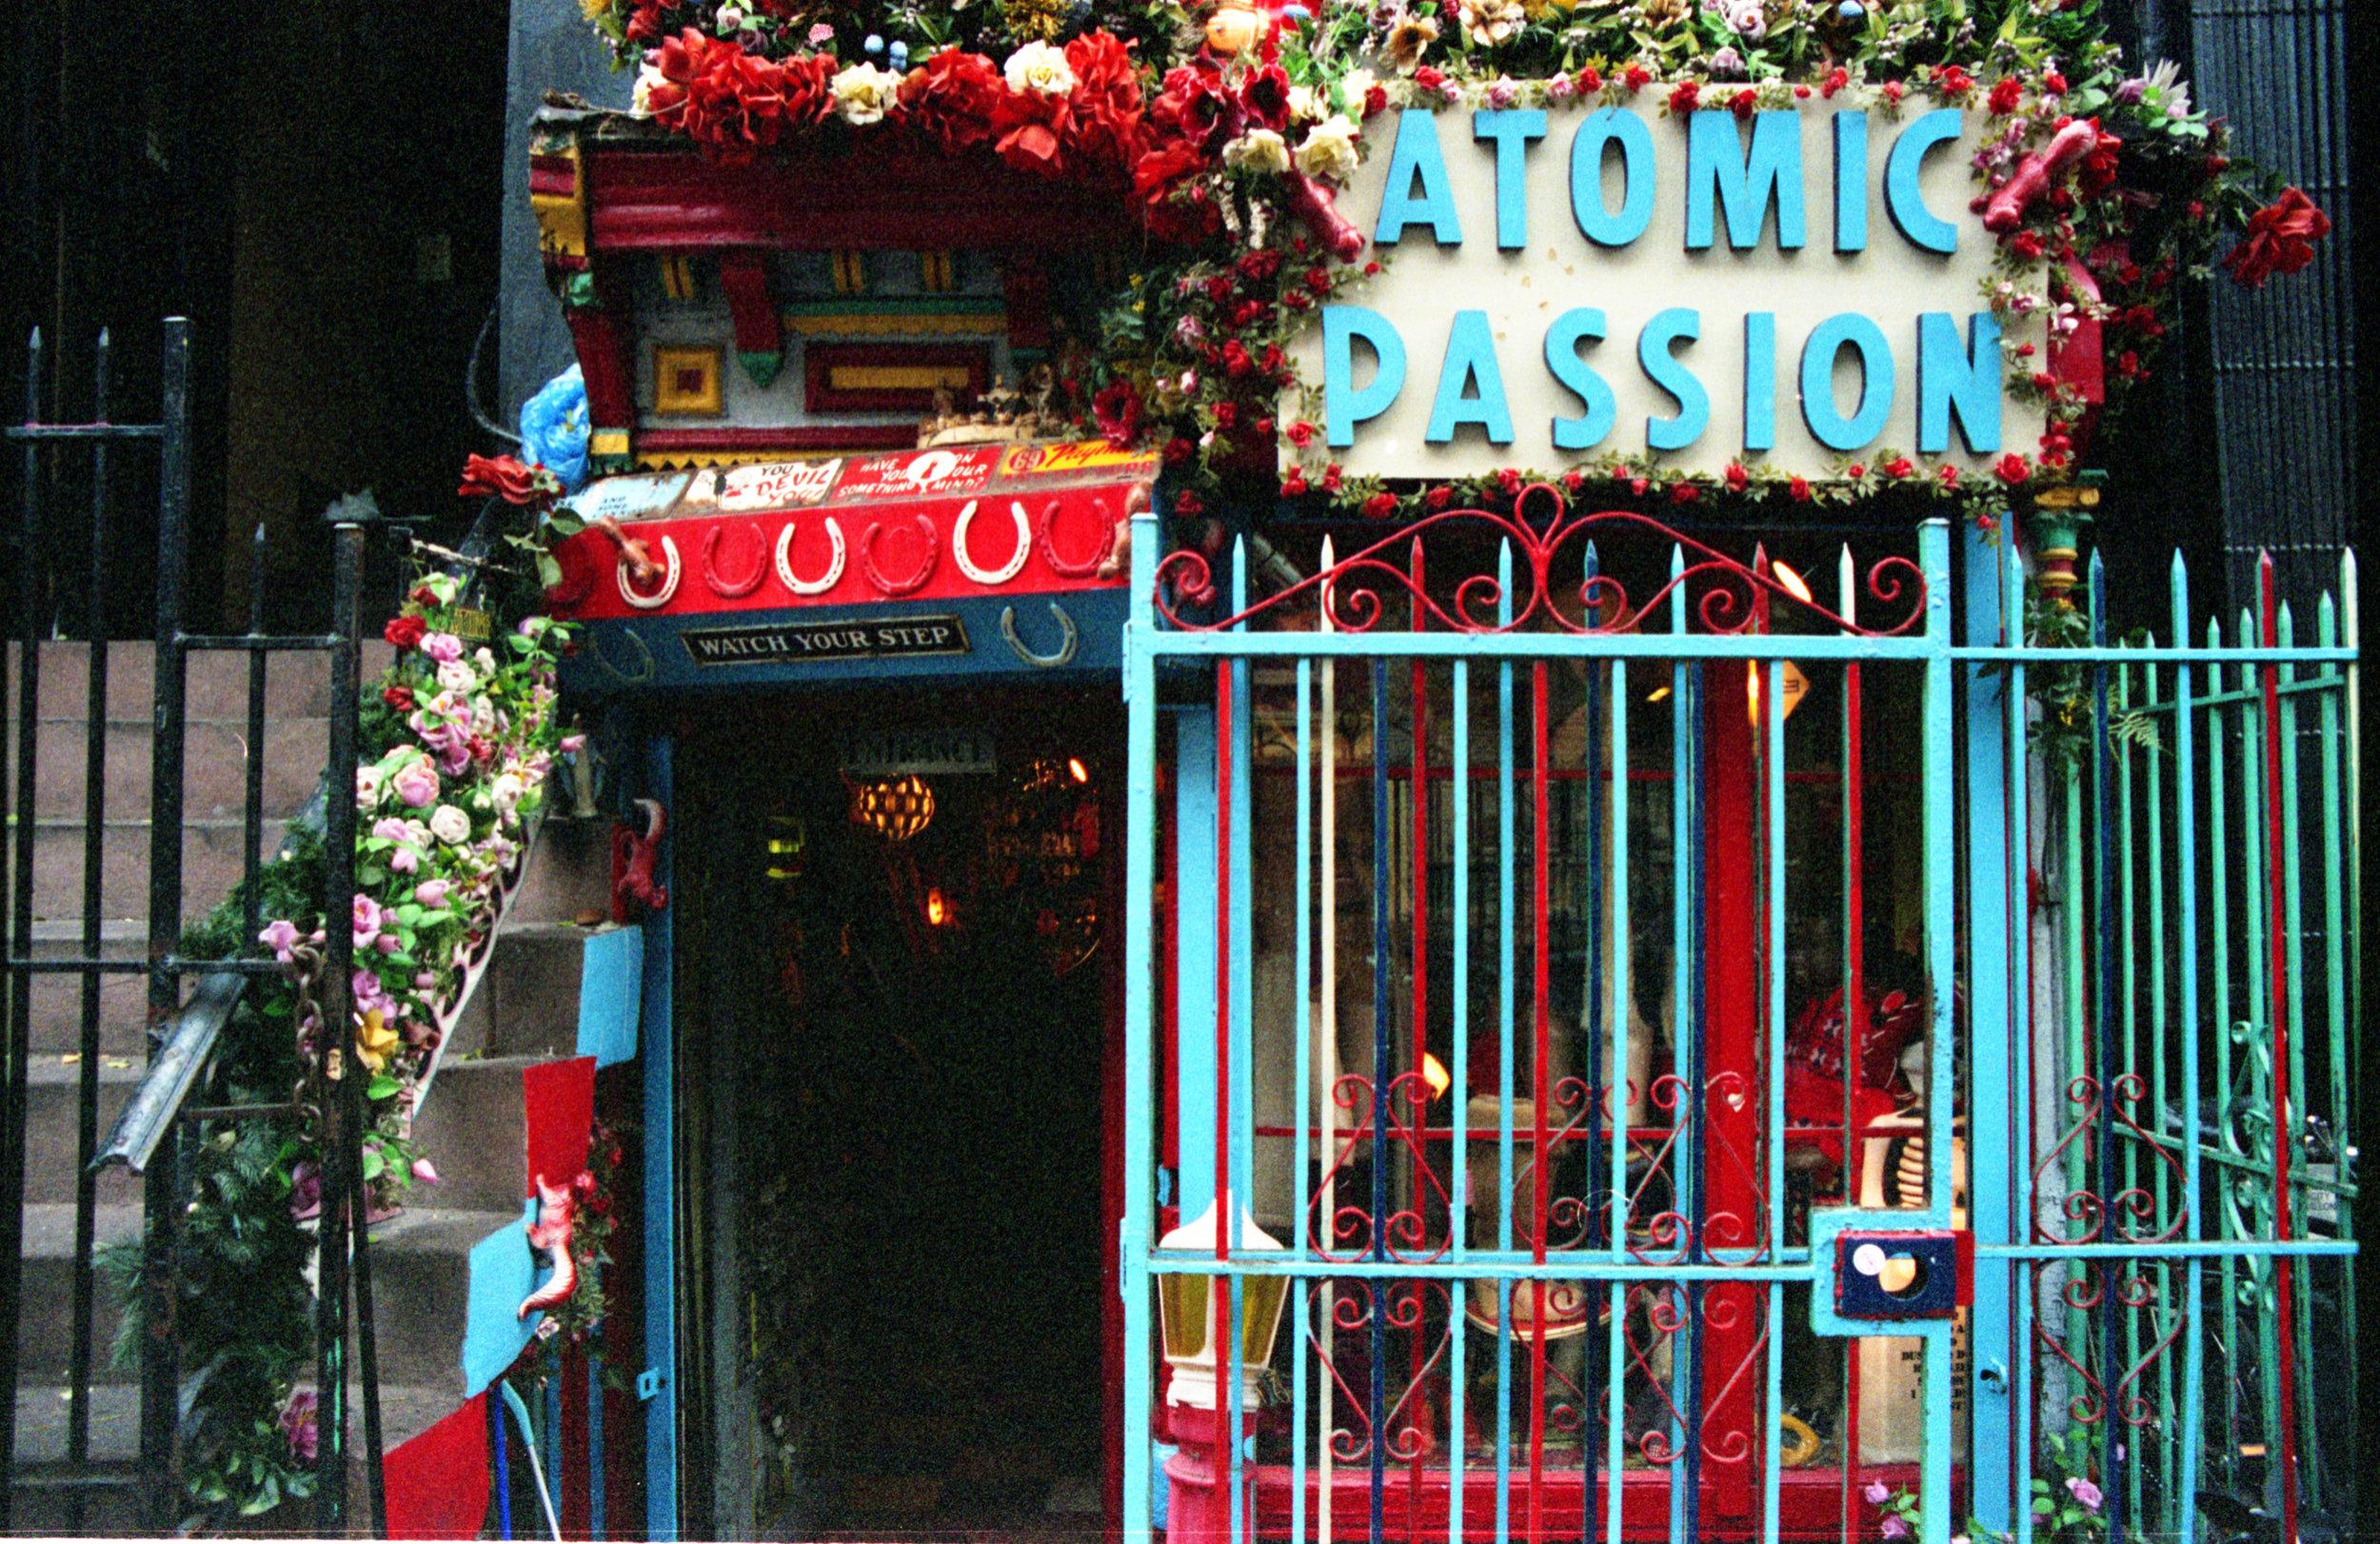 Atomic Passion Store, 430 E 9th Street, New York, NY